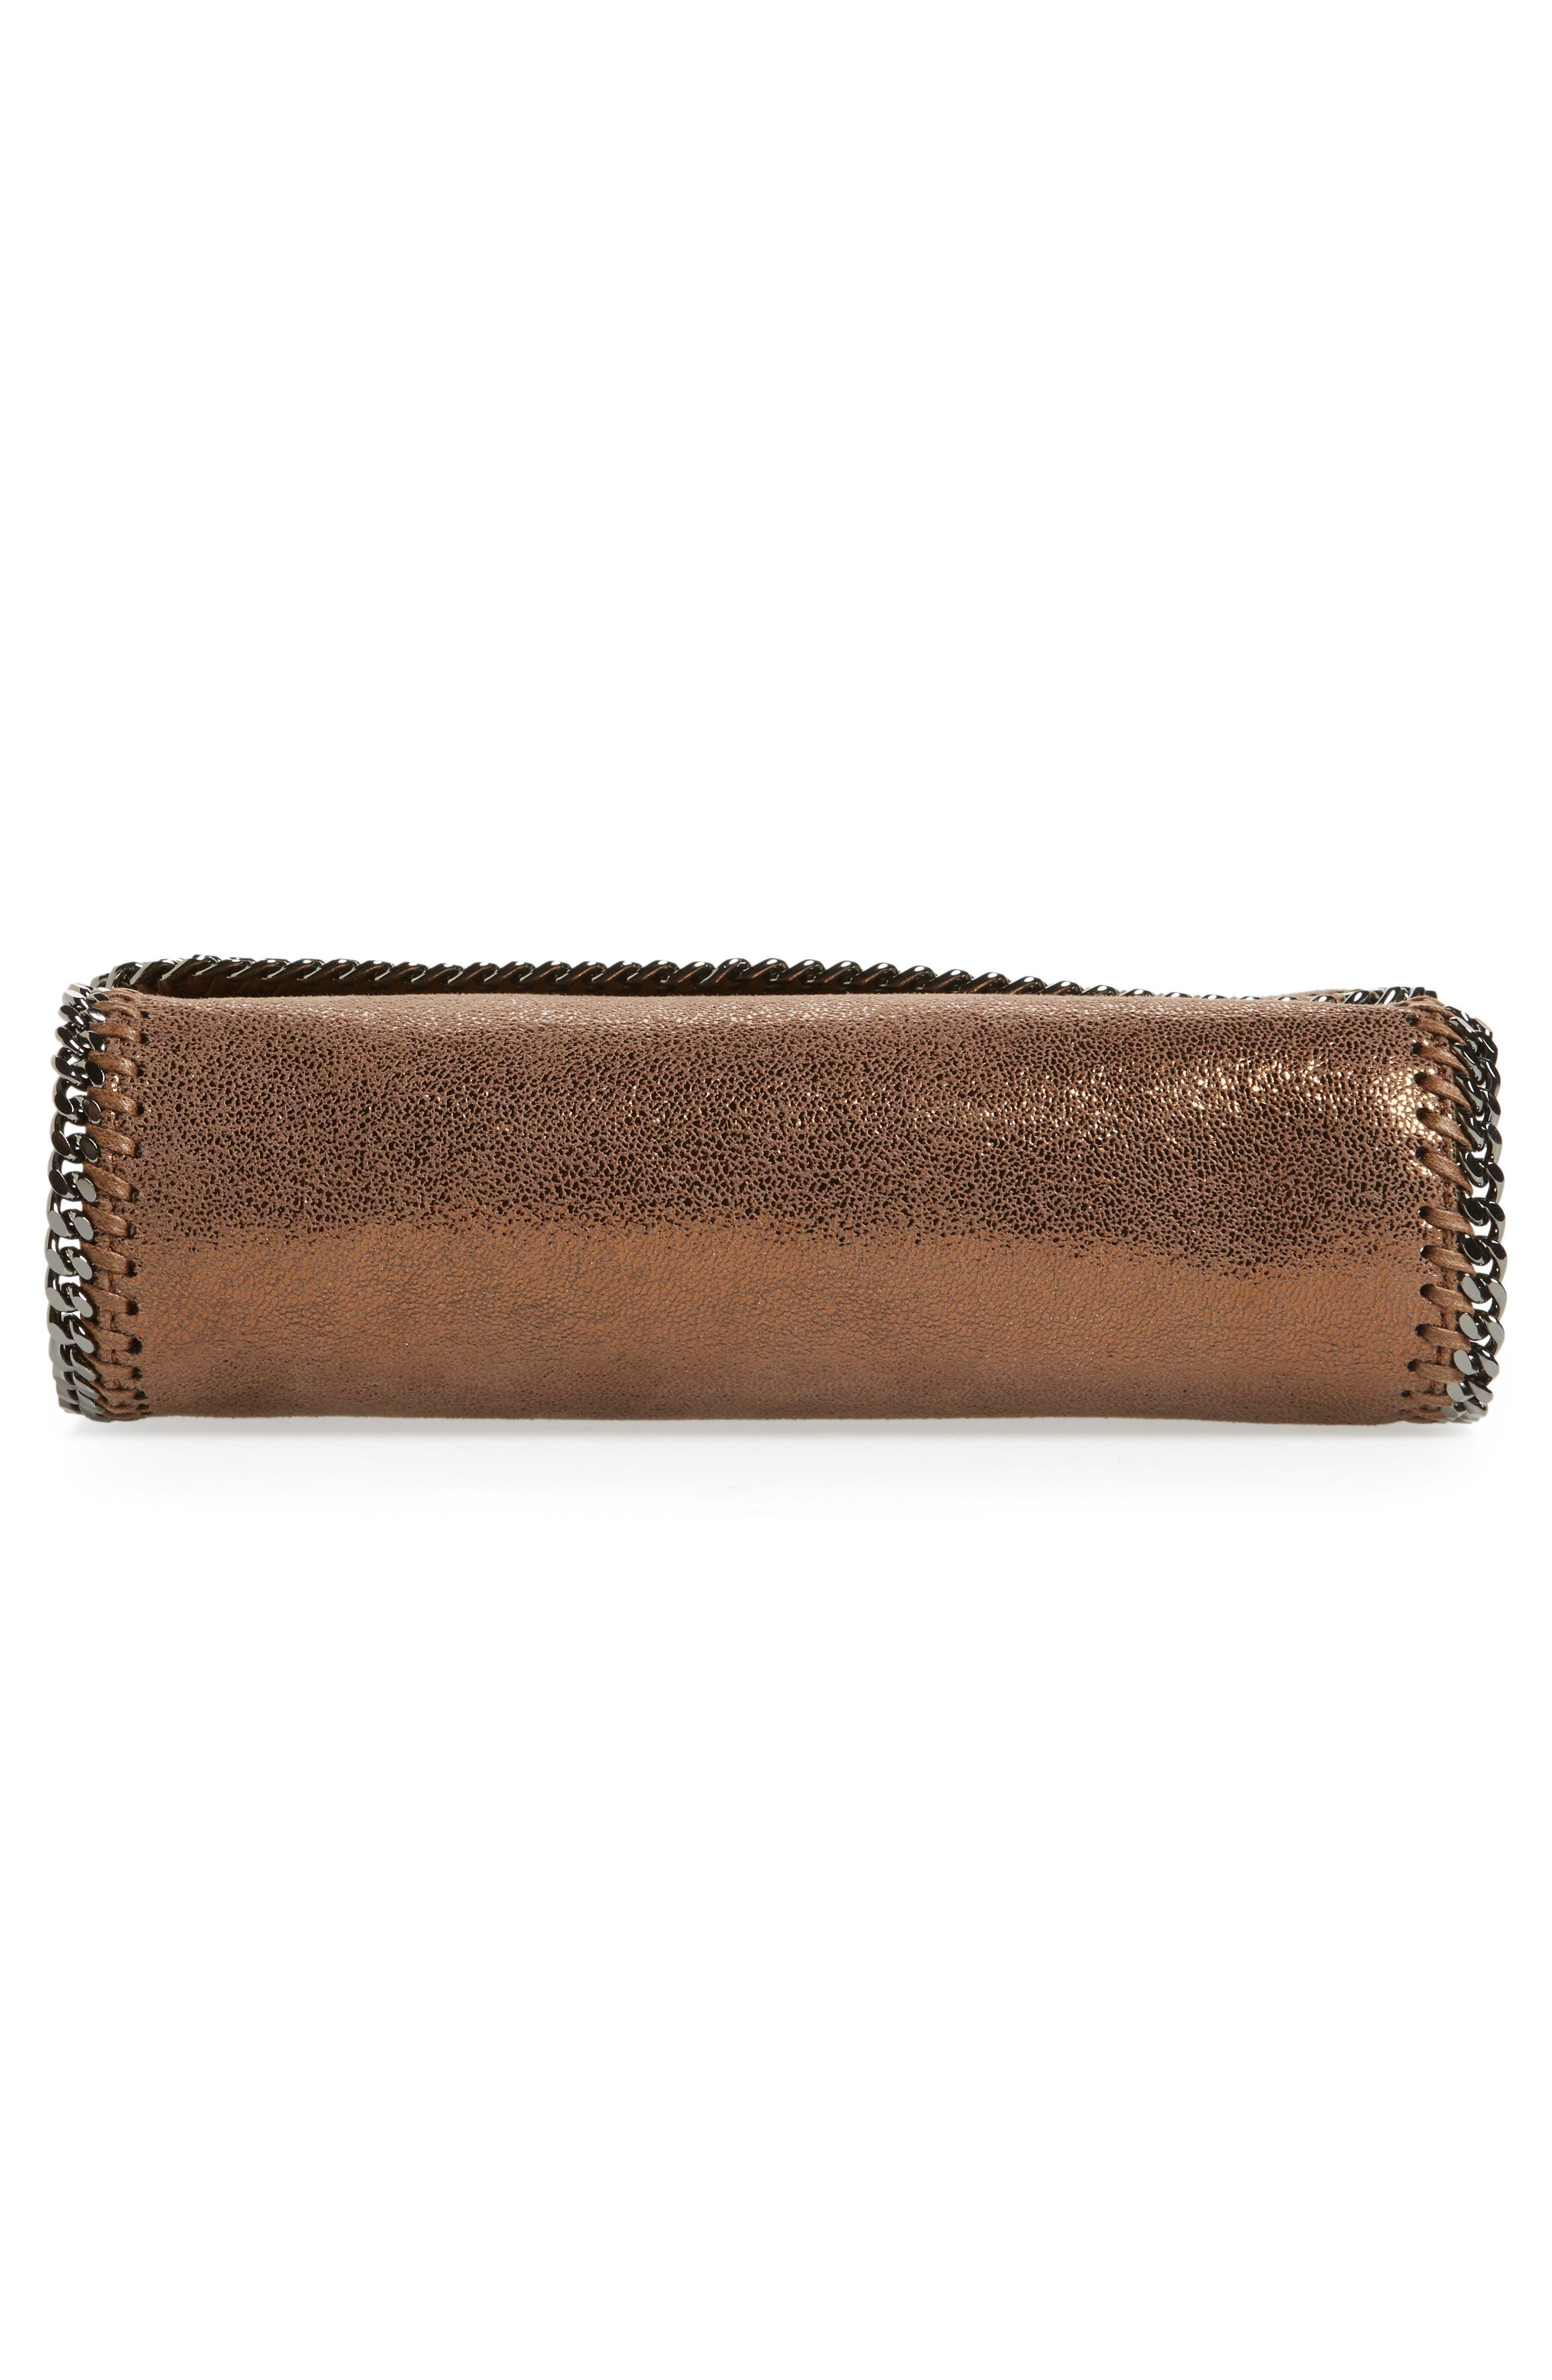 Falabella Metallic Faux Leather Convertible Shoulder Bag,                             Alternate thumbnail 6, color,                             200